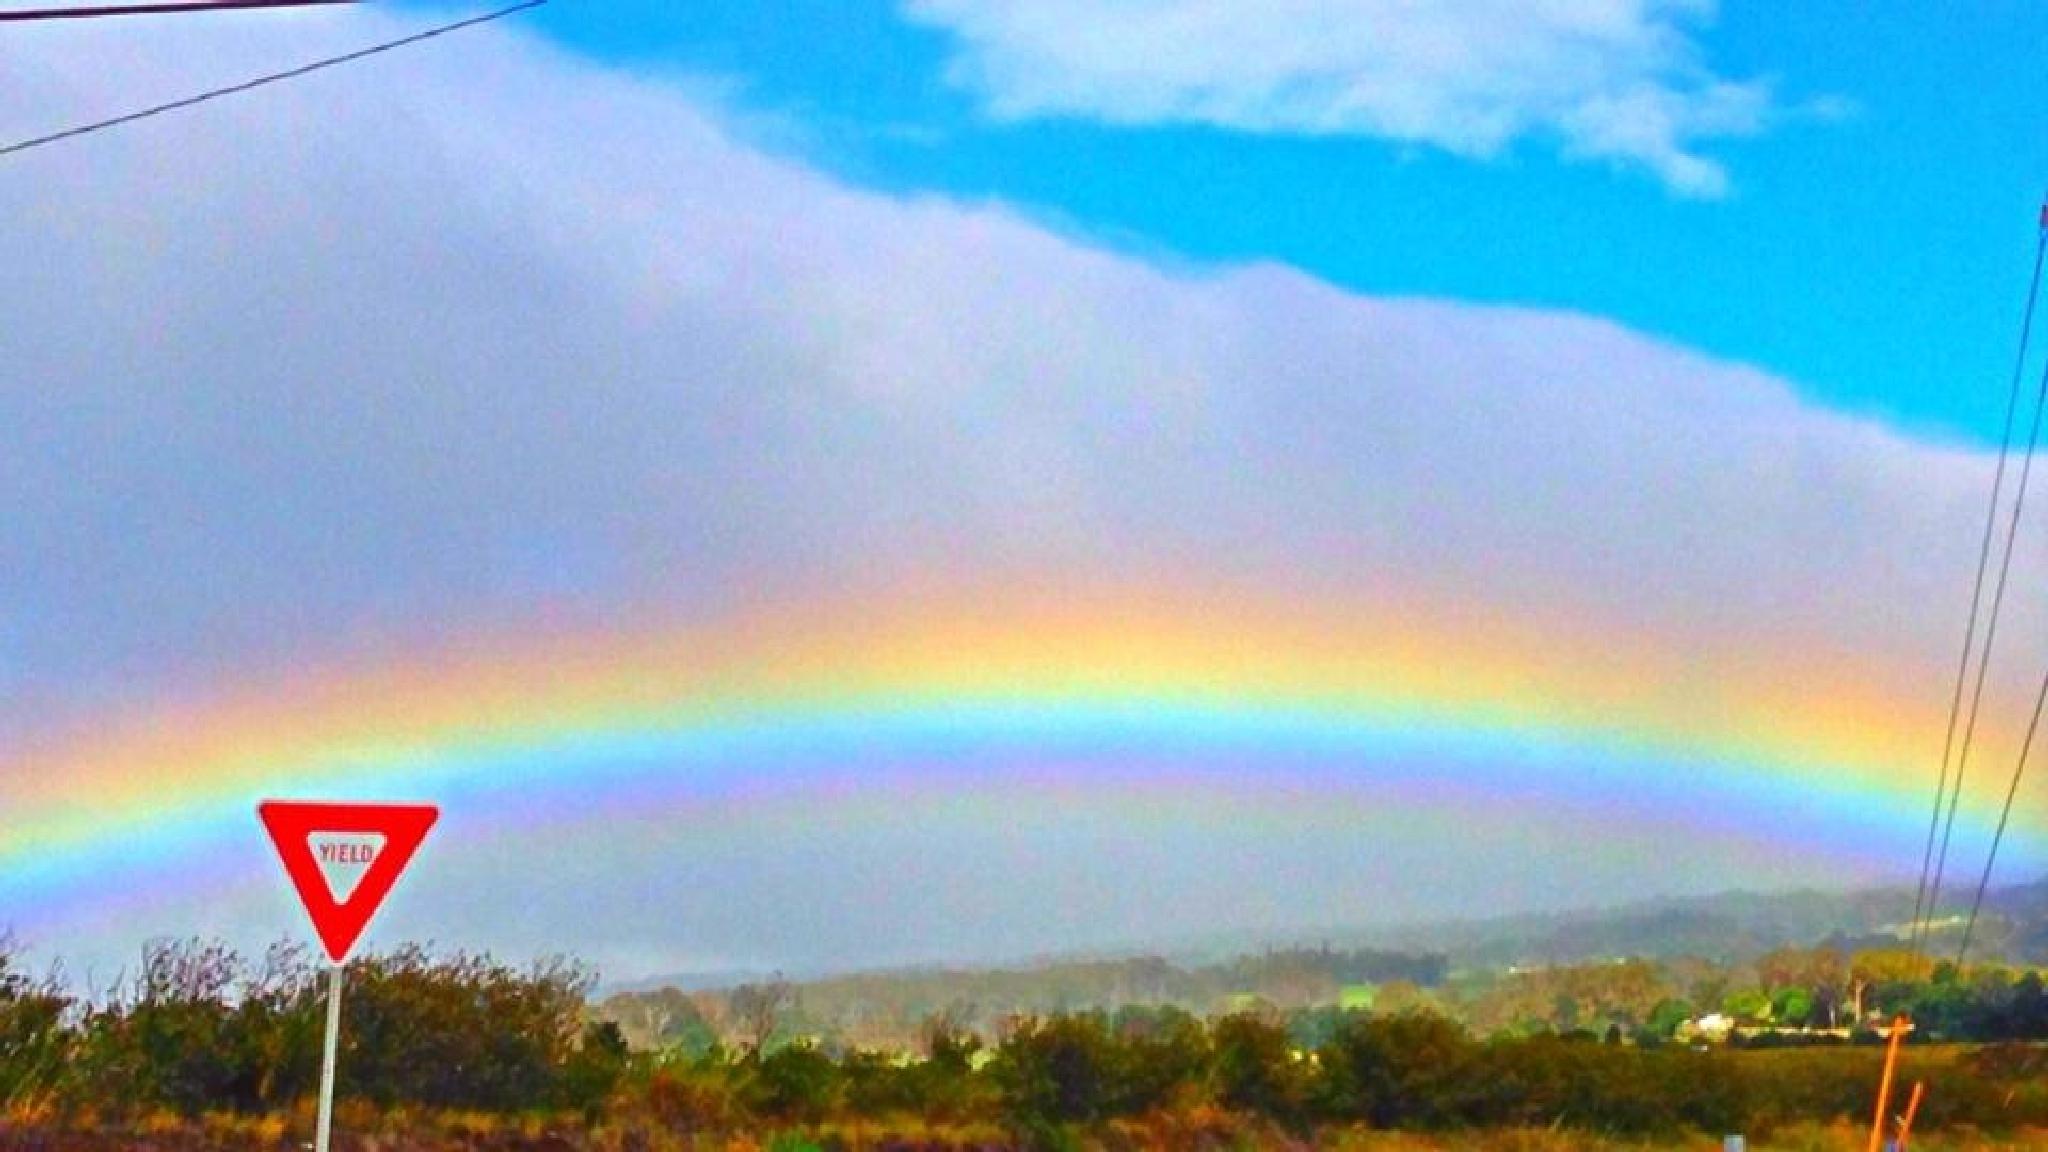 Yield to Rainbowes by MAUI UNDERGROUND